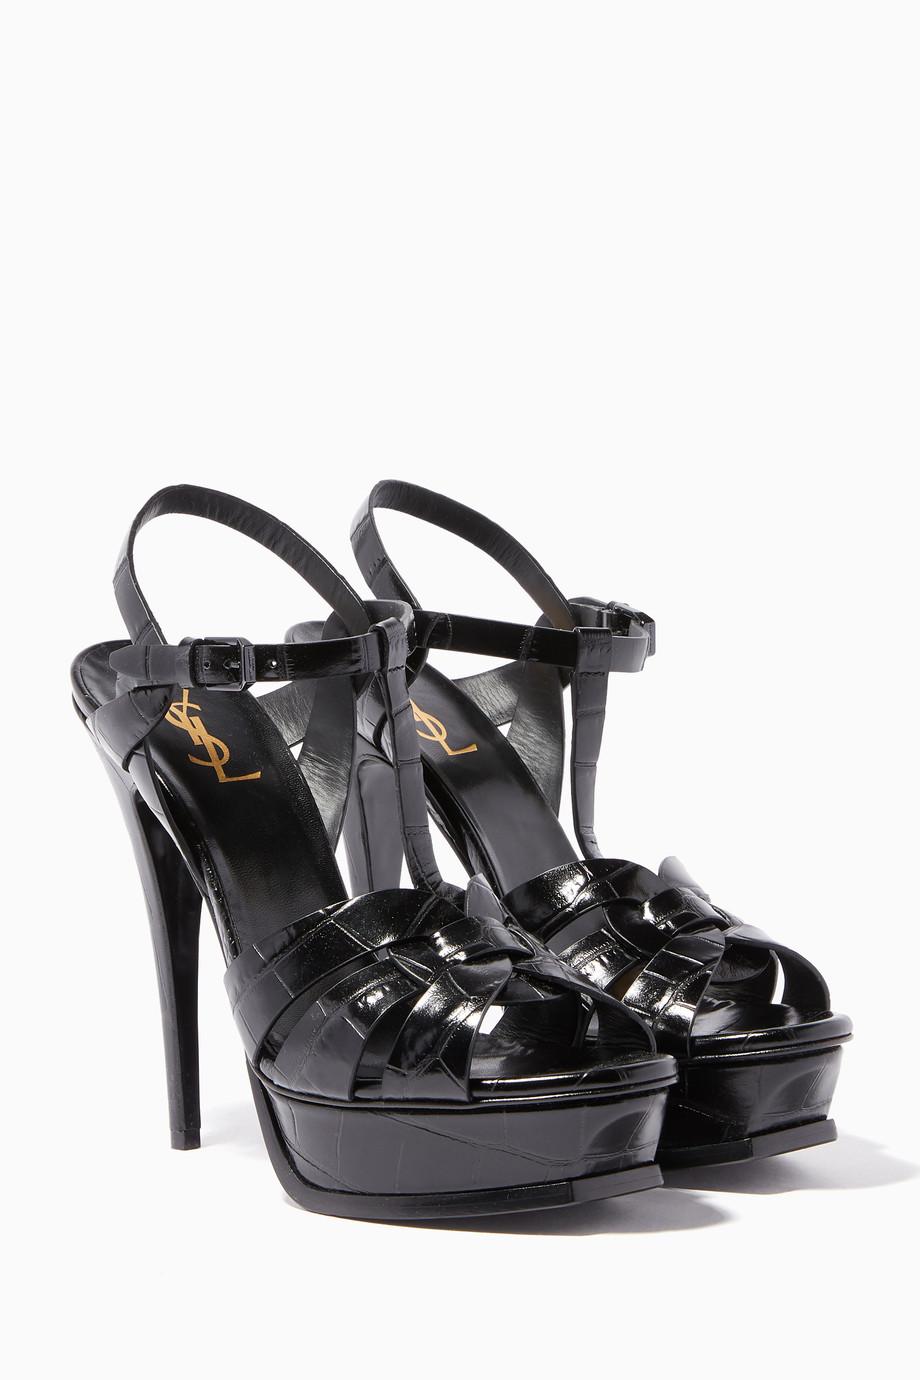 c24aa3227d Shop Saint Laurent Black Black Crocodile-Embossed Leather Tribute ...